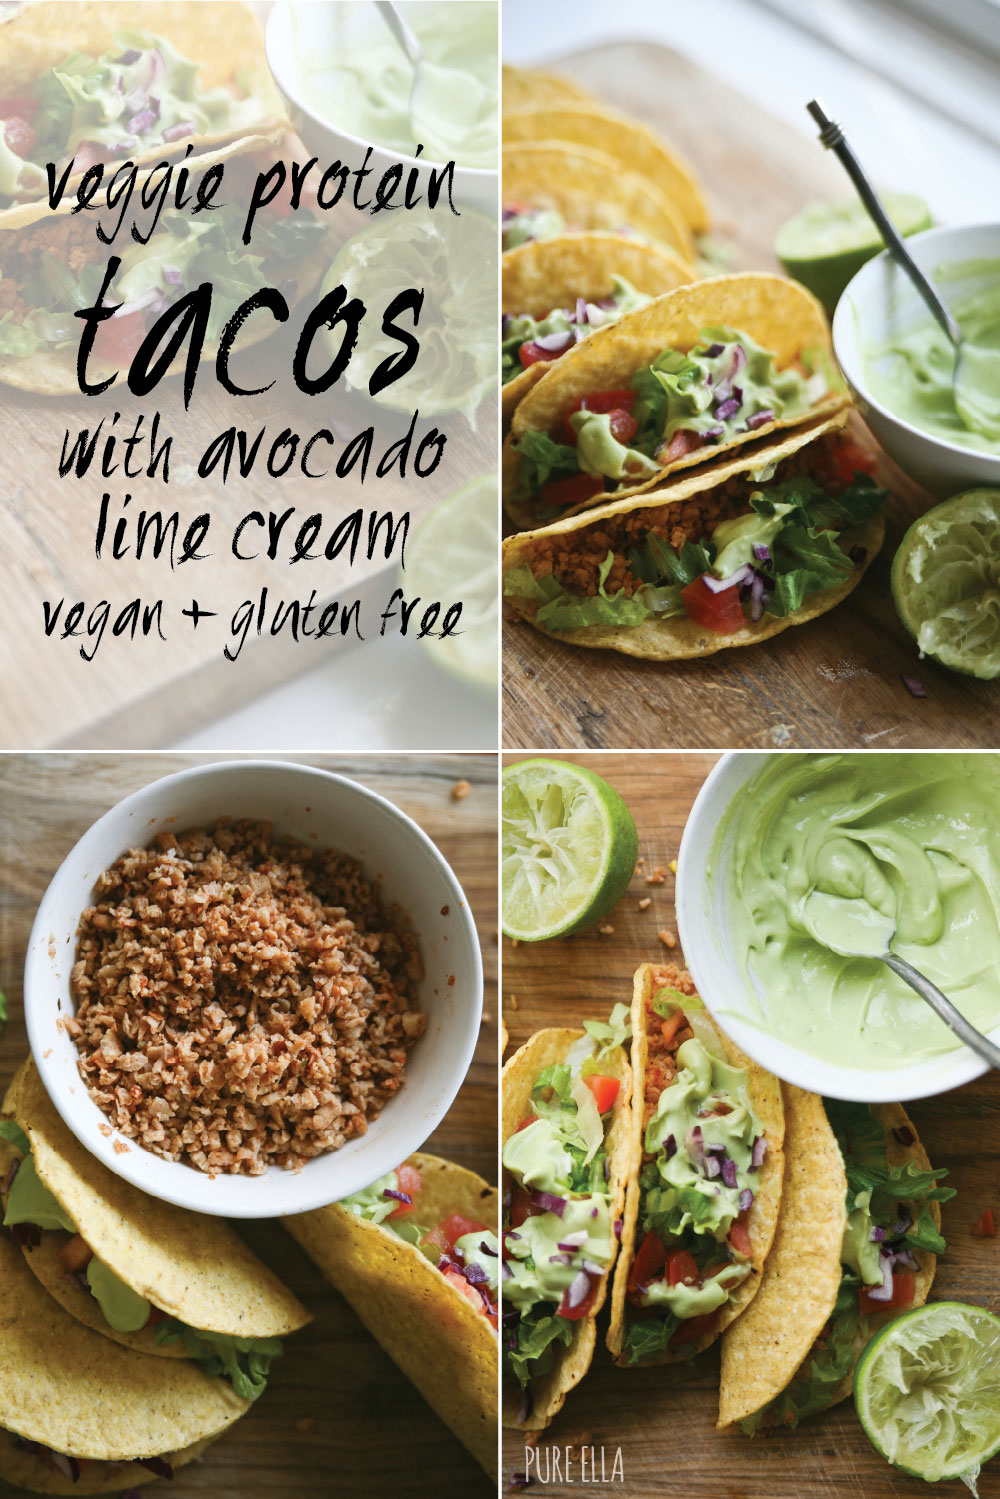 Pure-Ella-gluten-free-and-vegan-Veggie-Protein-Tacos-with-avocado-lime-cream5